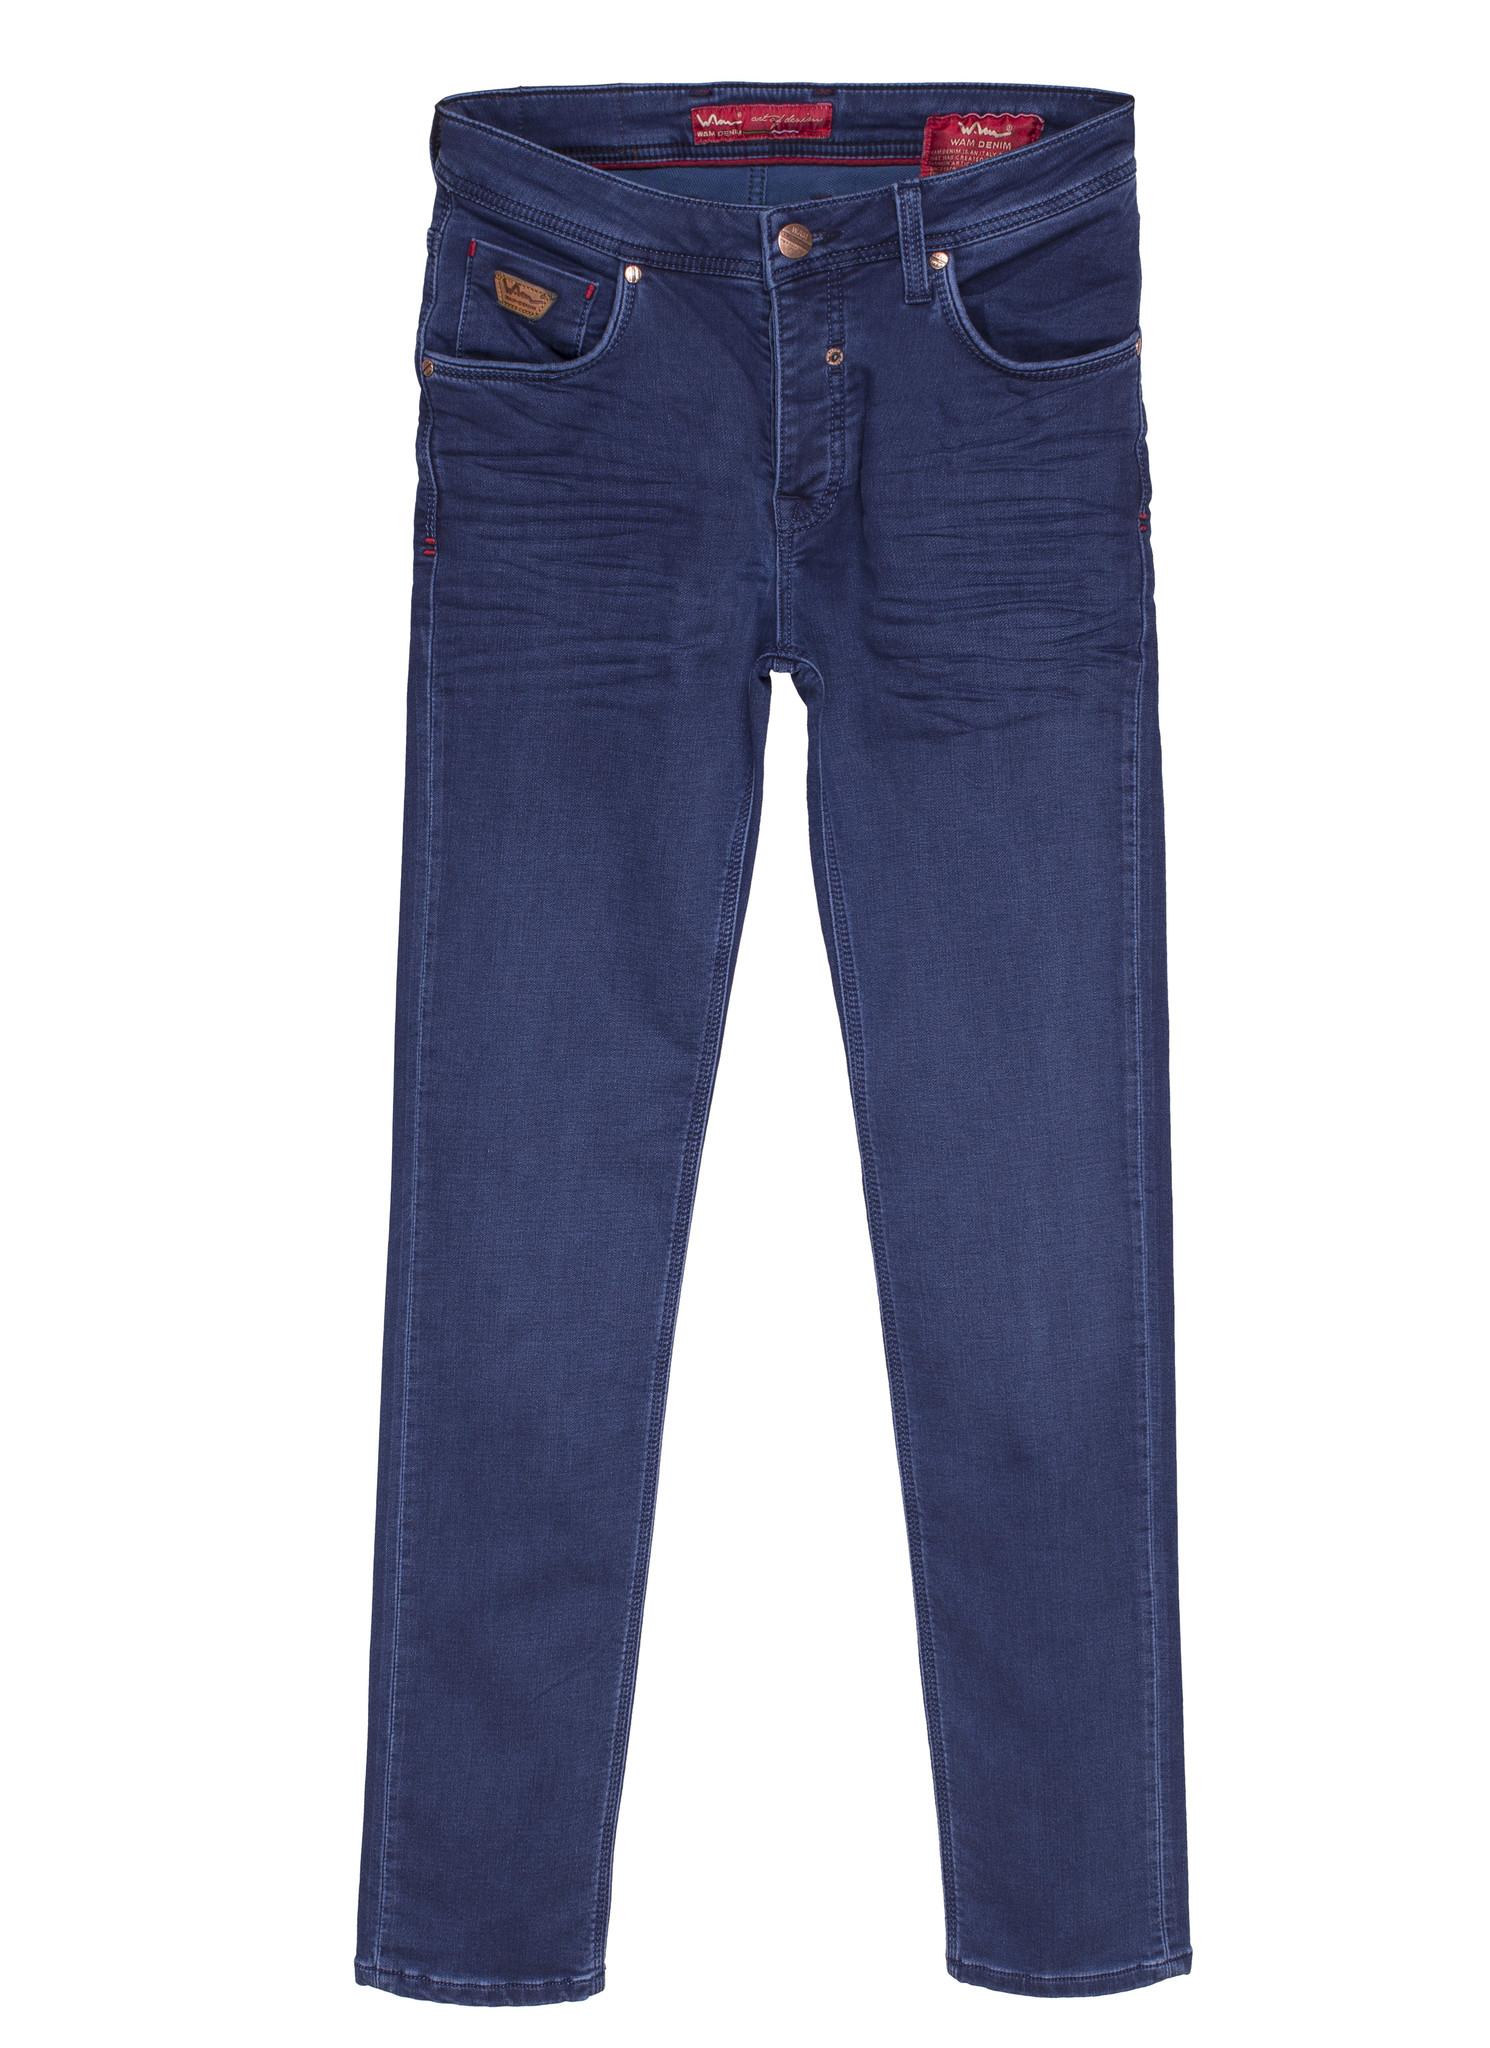 Wam Denim Jeans 92148 Blue